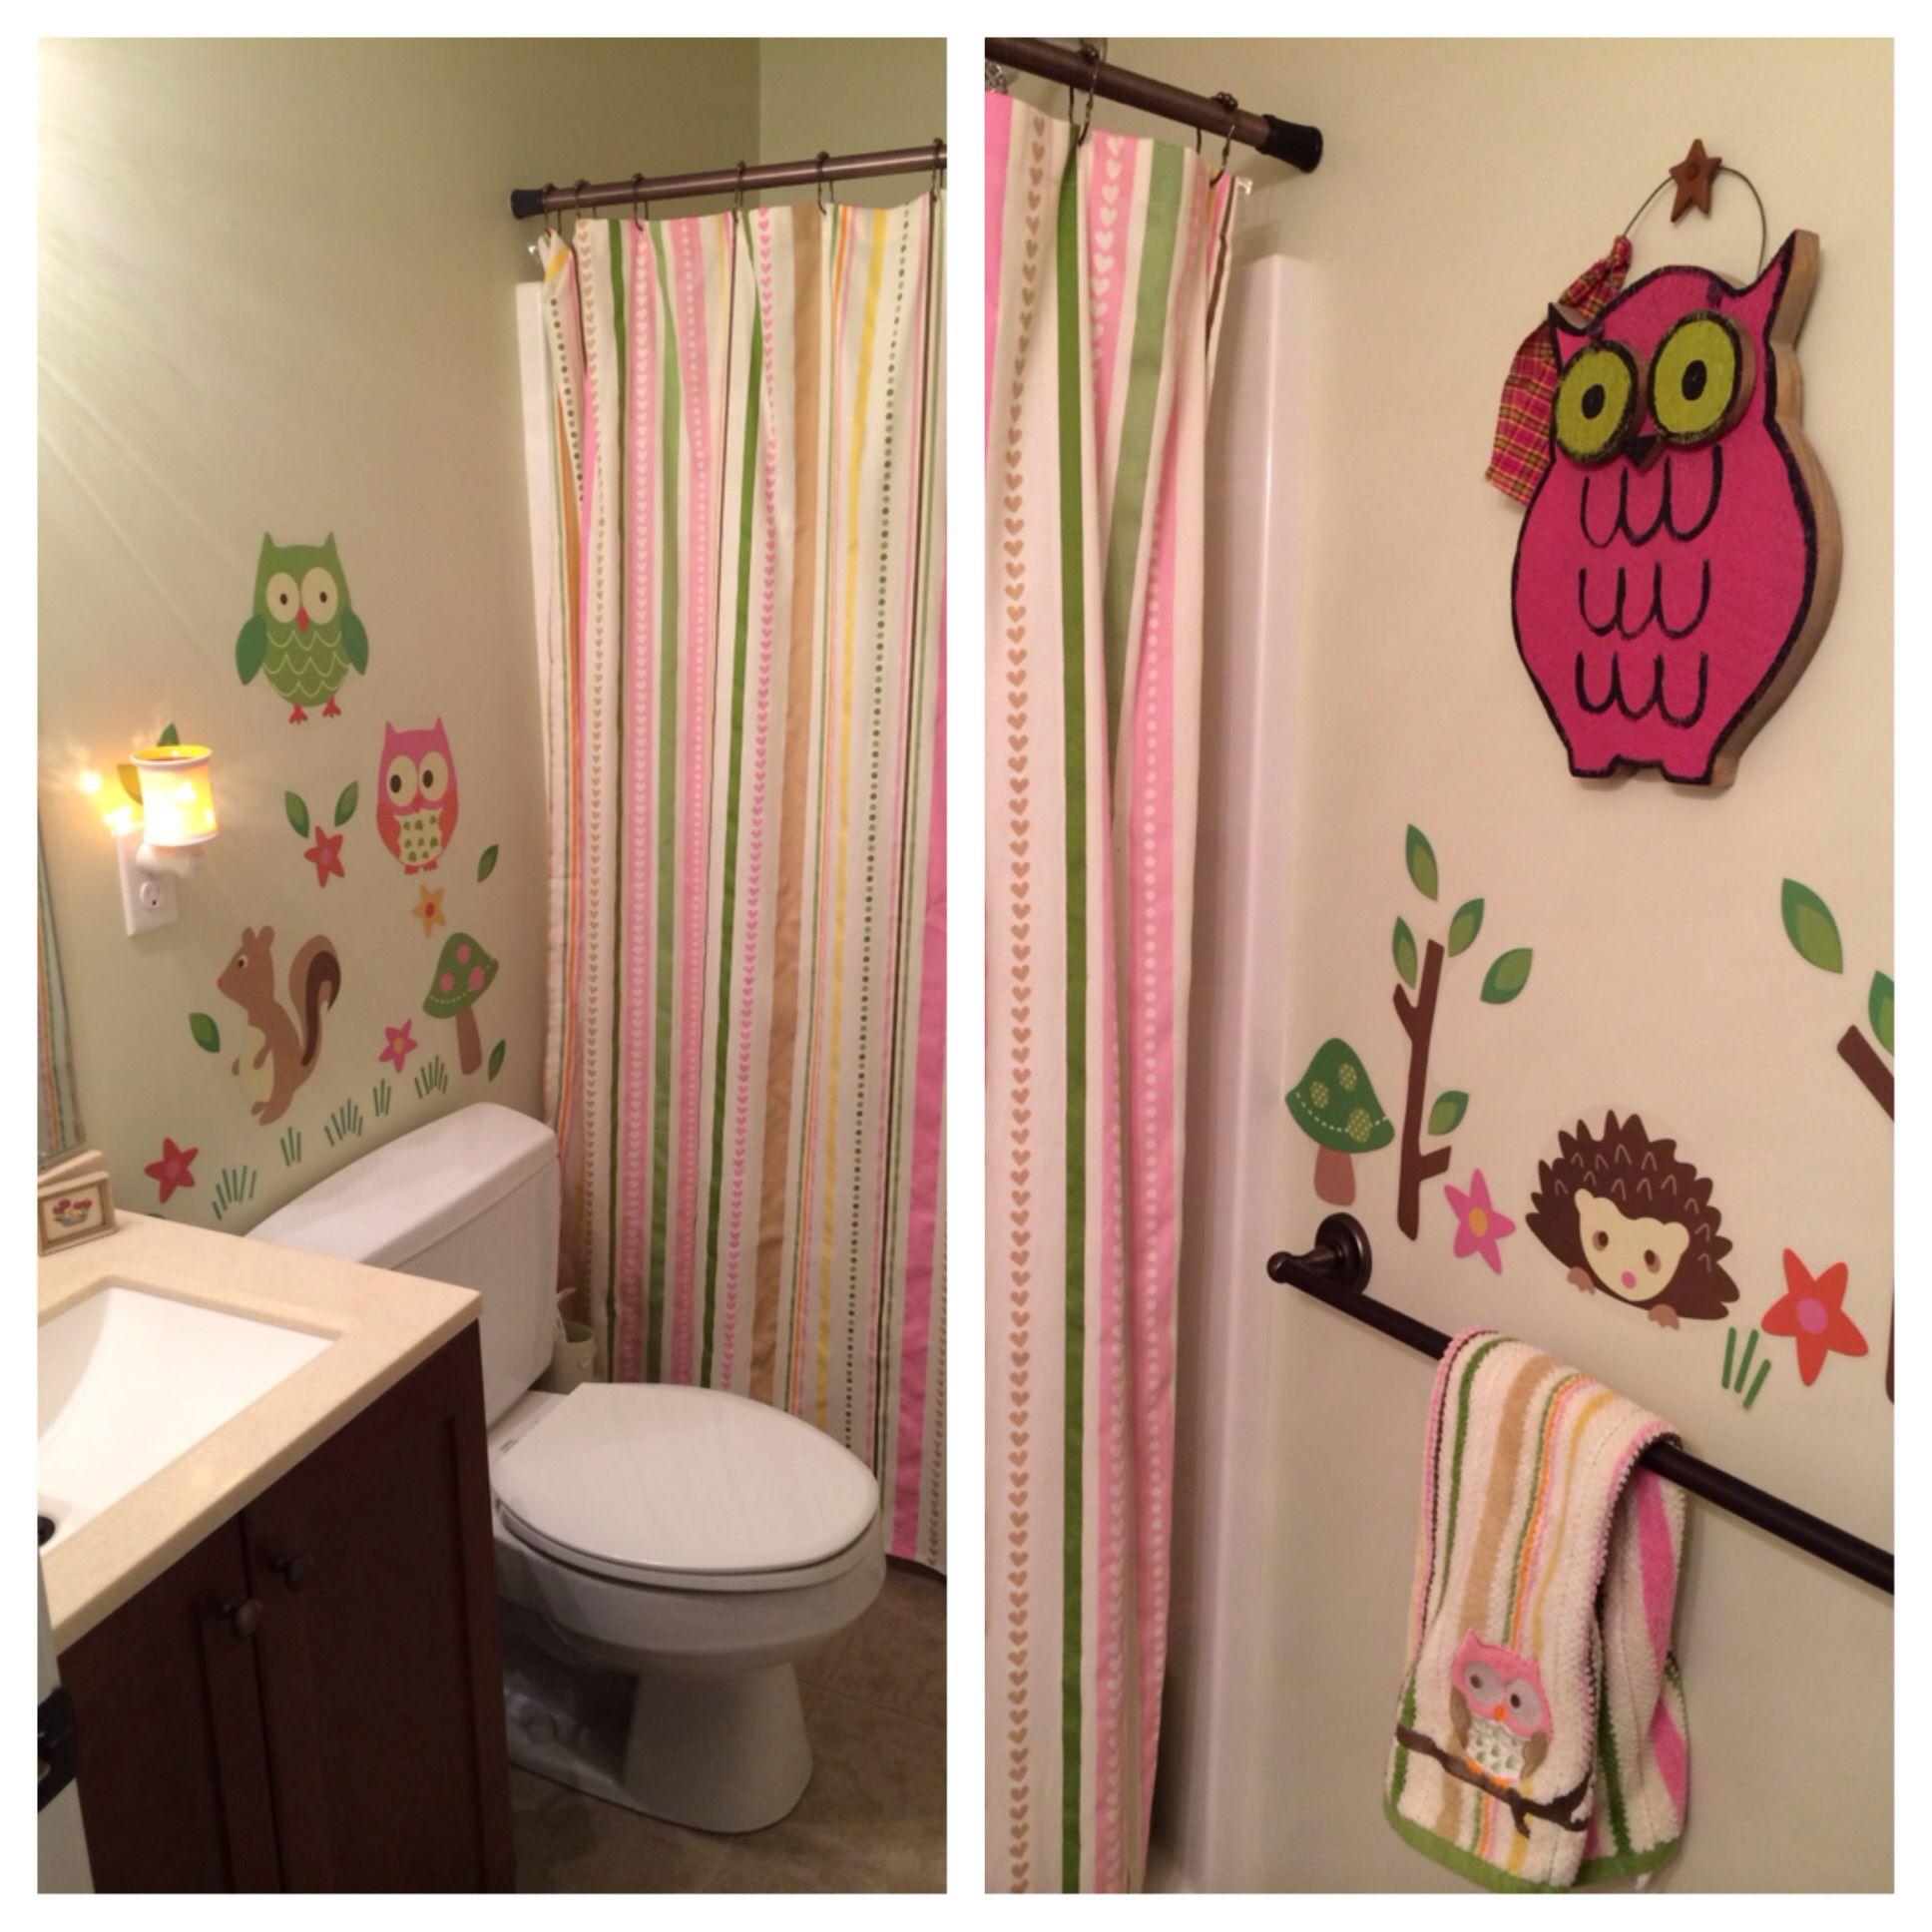 Our owl bathroom set from target dorm room pinterest for Bathroom decor at target